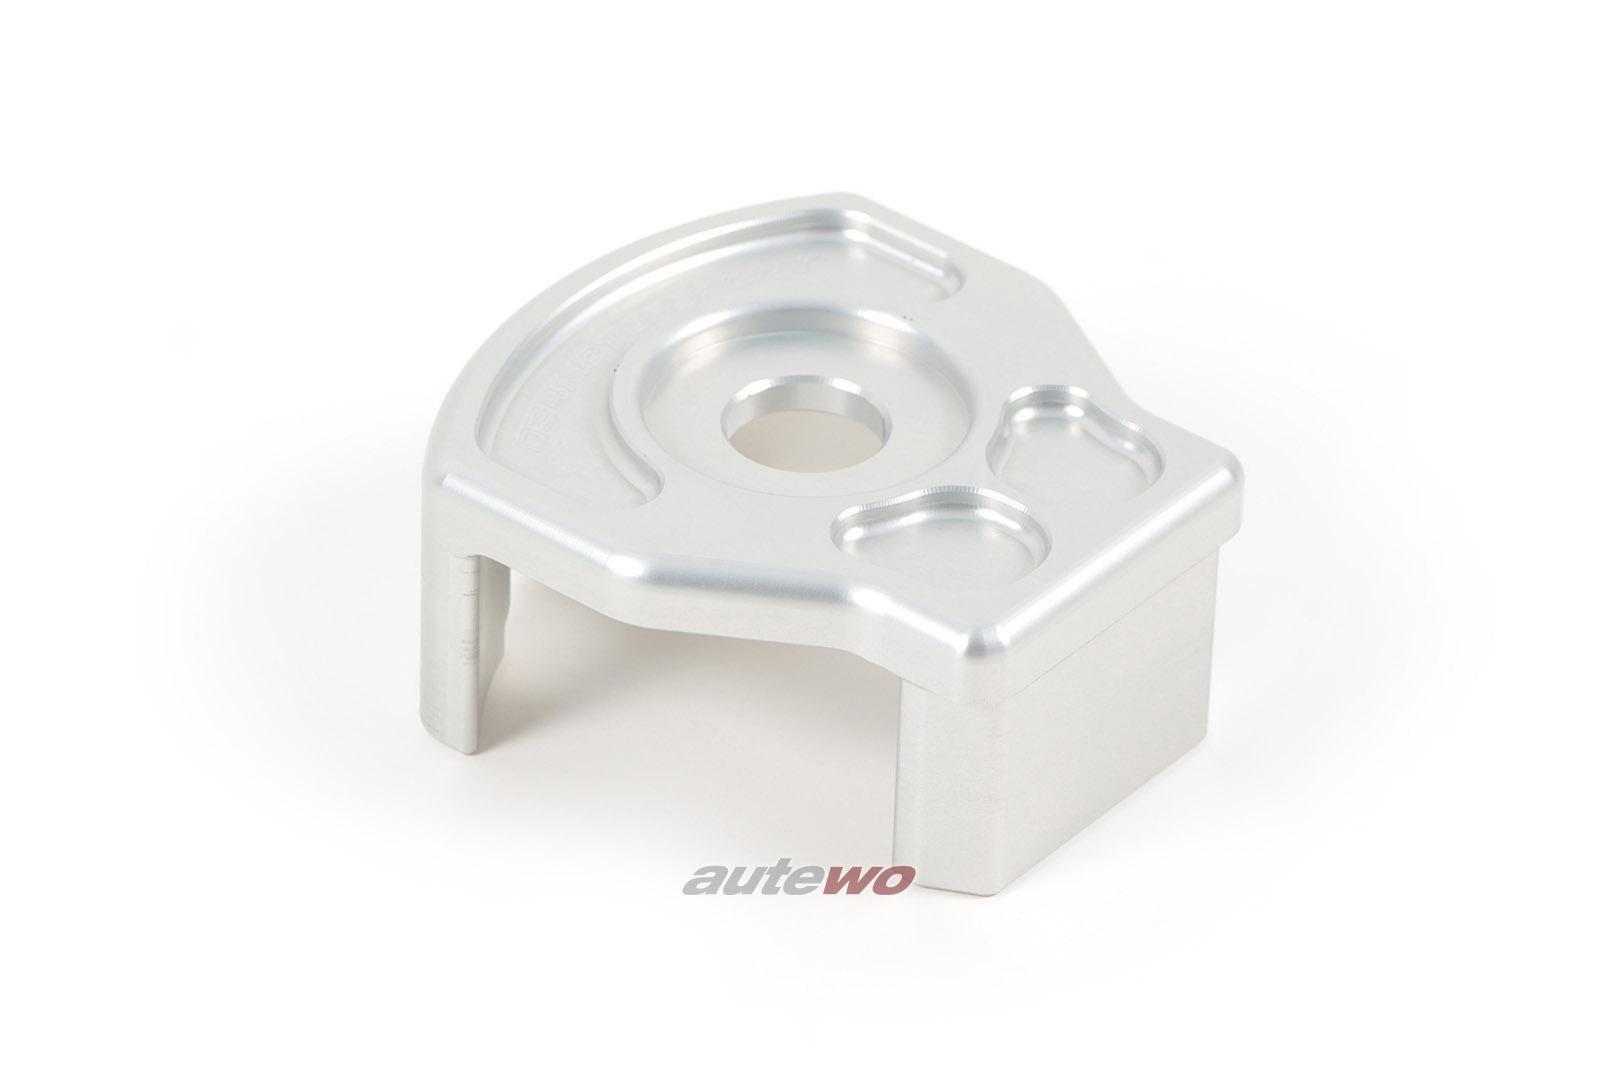 034Motorsport Audi/VW/SEAT/Skoda A3 8P/TT 8J Dogbone Mount Insert 034-509-1020